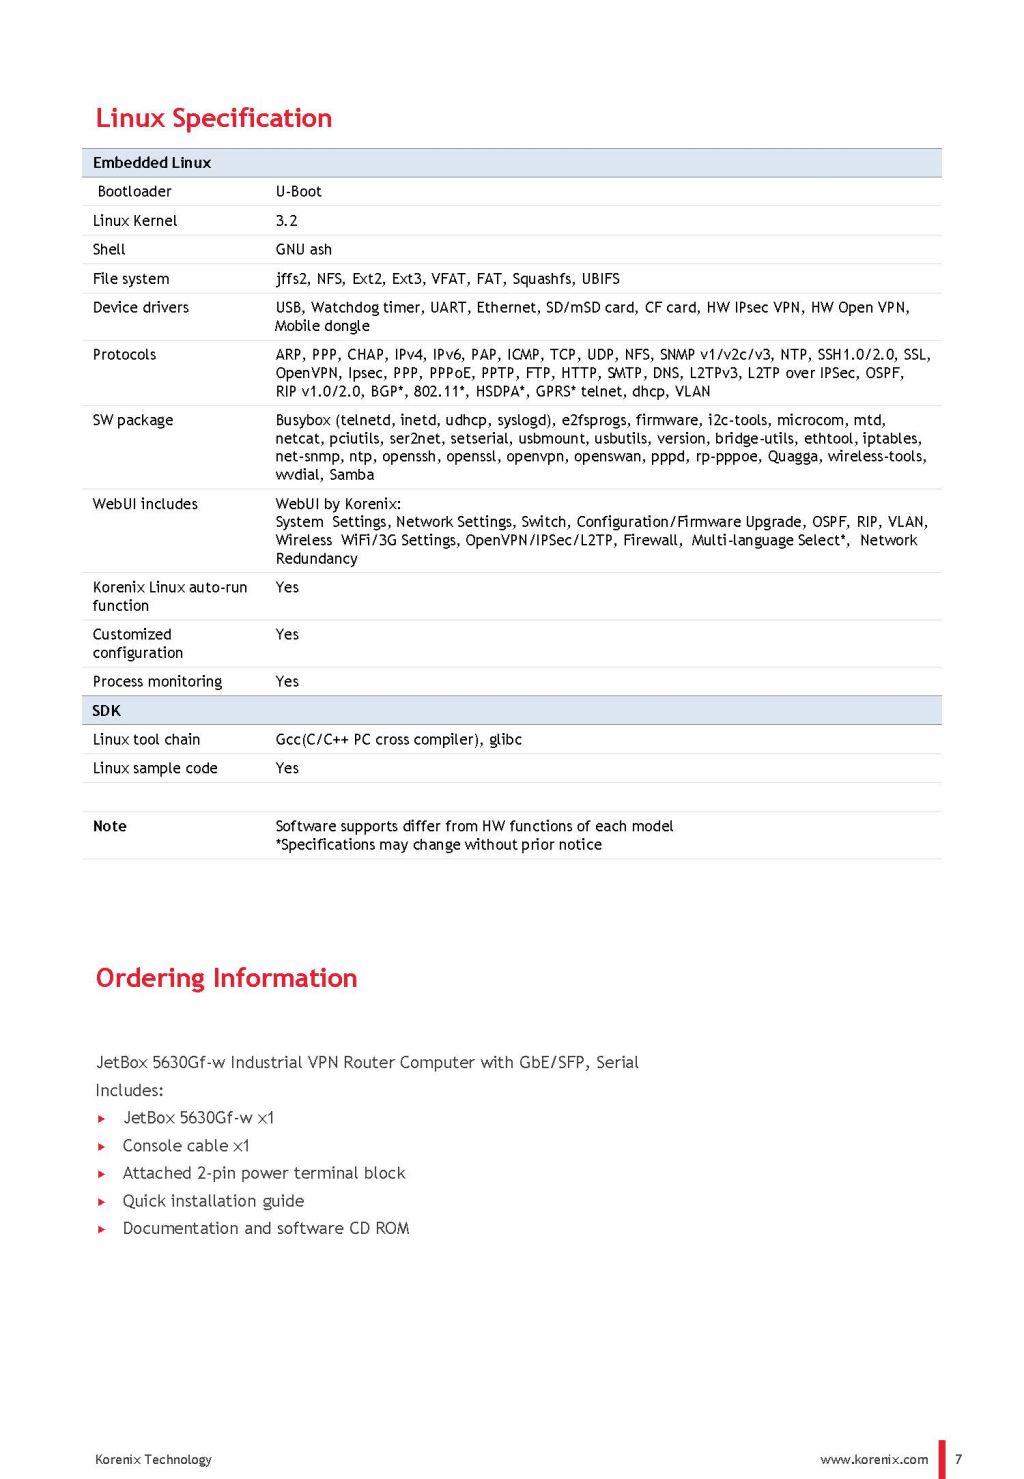 Korenix JetNet 5810G Industrial 8FE + 2G Combo DC Booster Switch